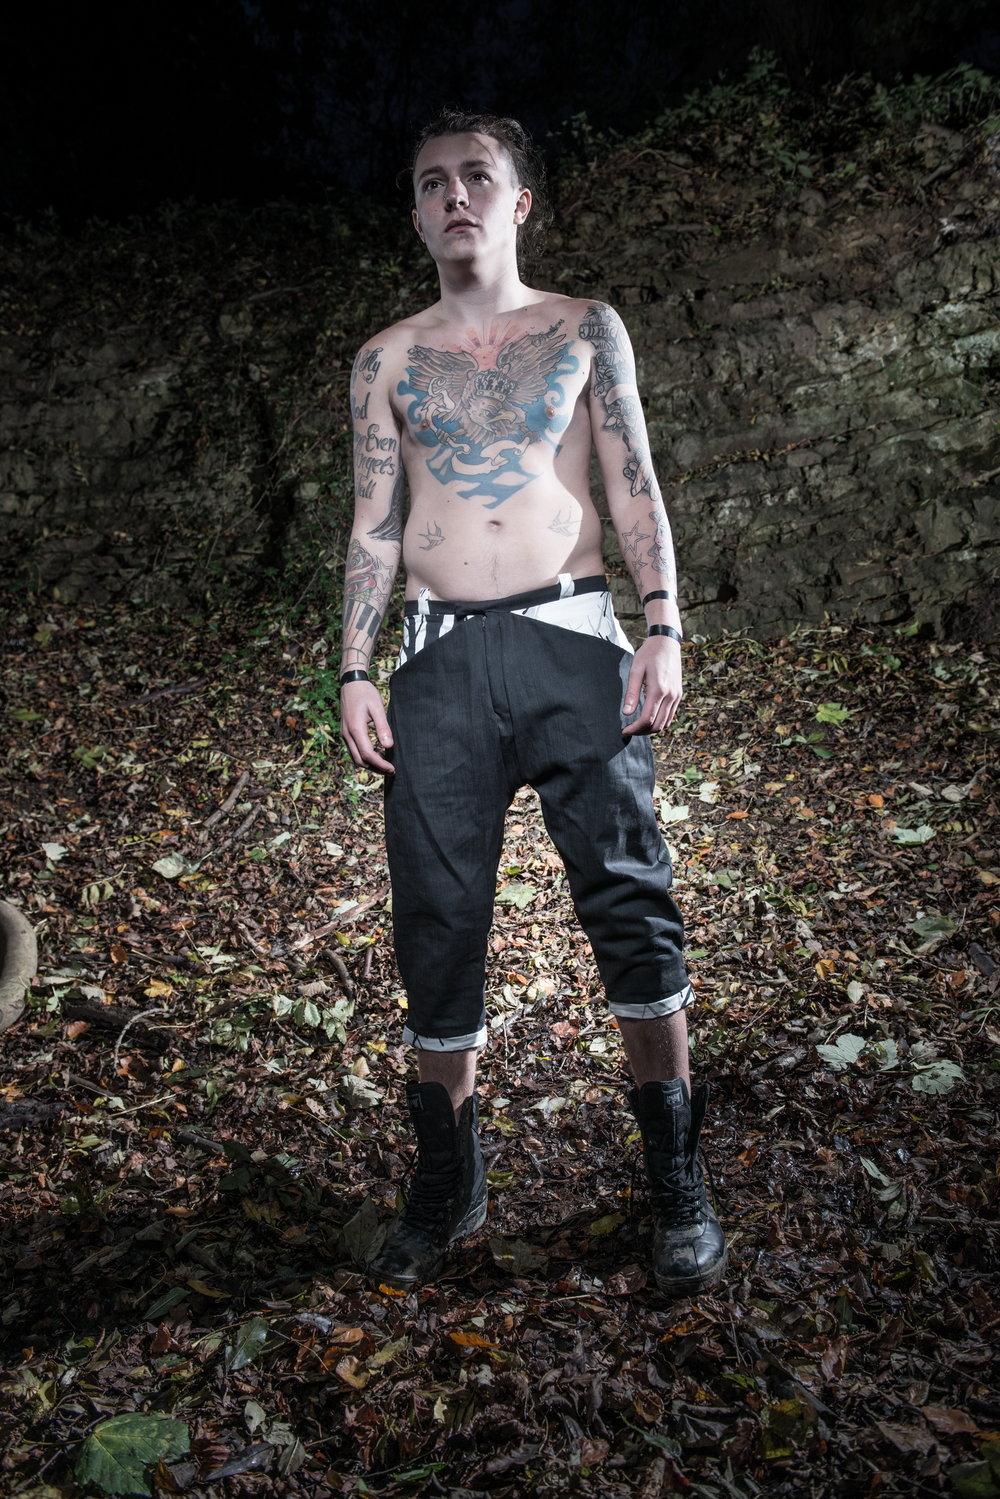 zaramia-ava-zaramiaava-leeds-fashion-designer-ethical-sustainable-tailored-minimalist-versatile-drape-grey-shirt-vest-top-denim-trousers-black-grey-texture-styling-menswear-model-photoshoot-11